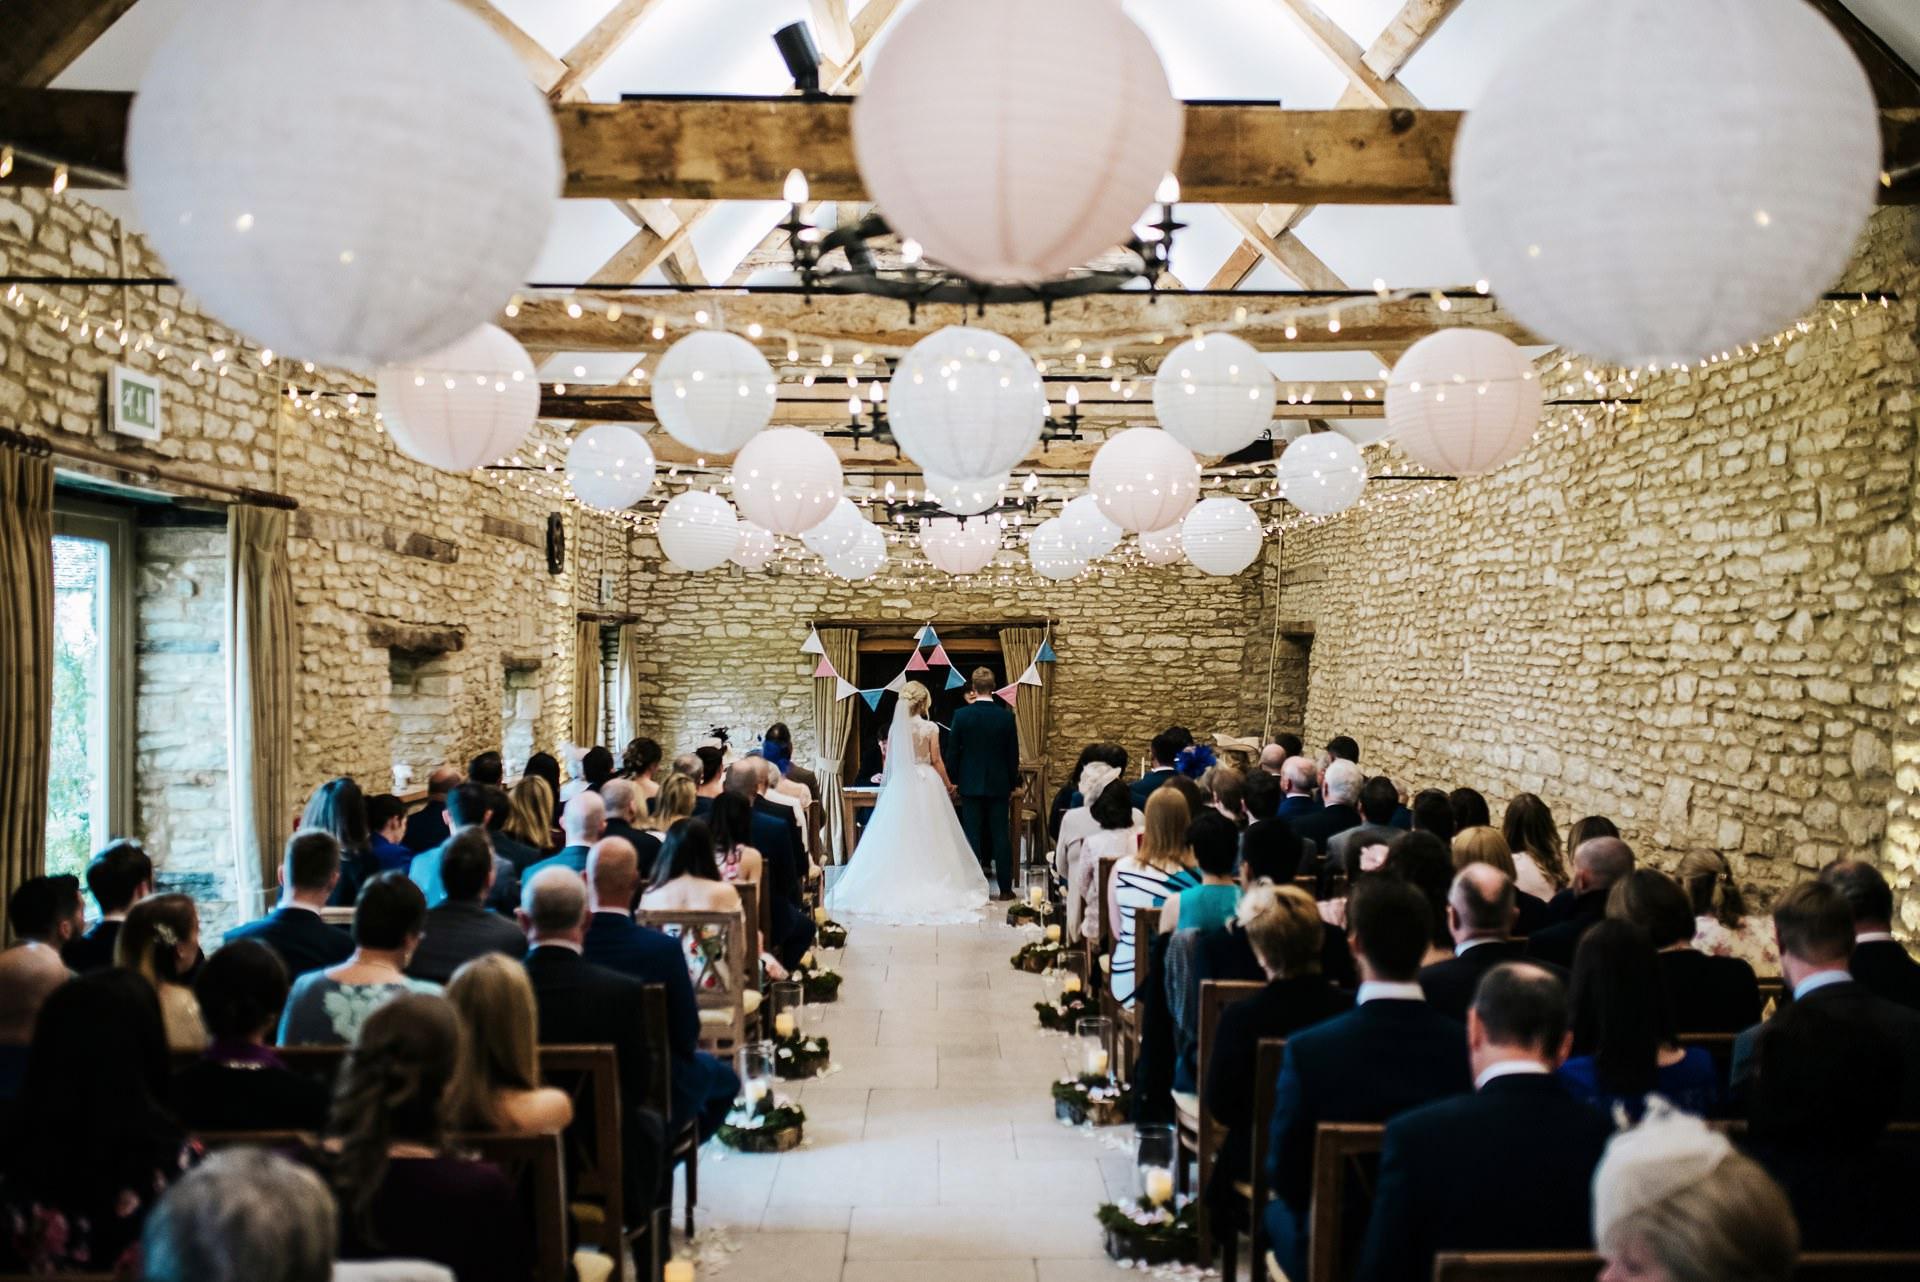 Caswell House Wedding Photographer - Jessica & Chris 7